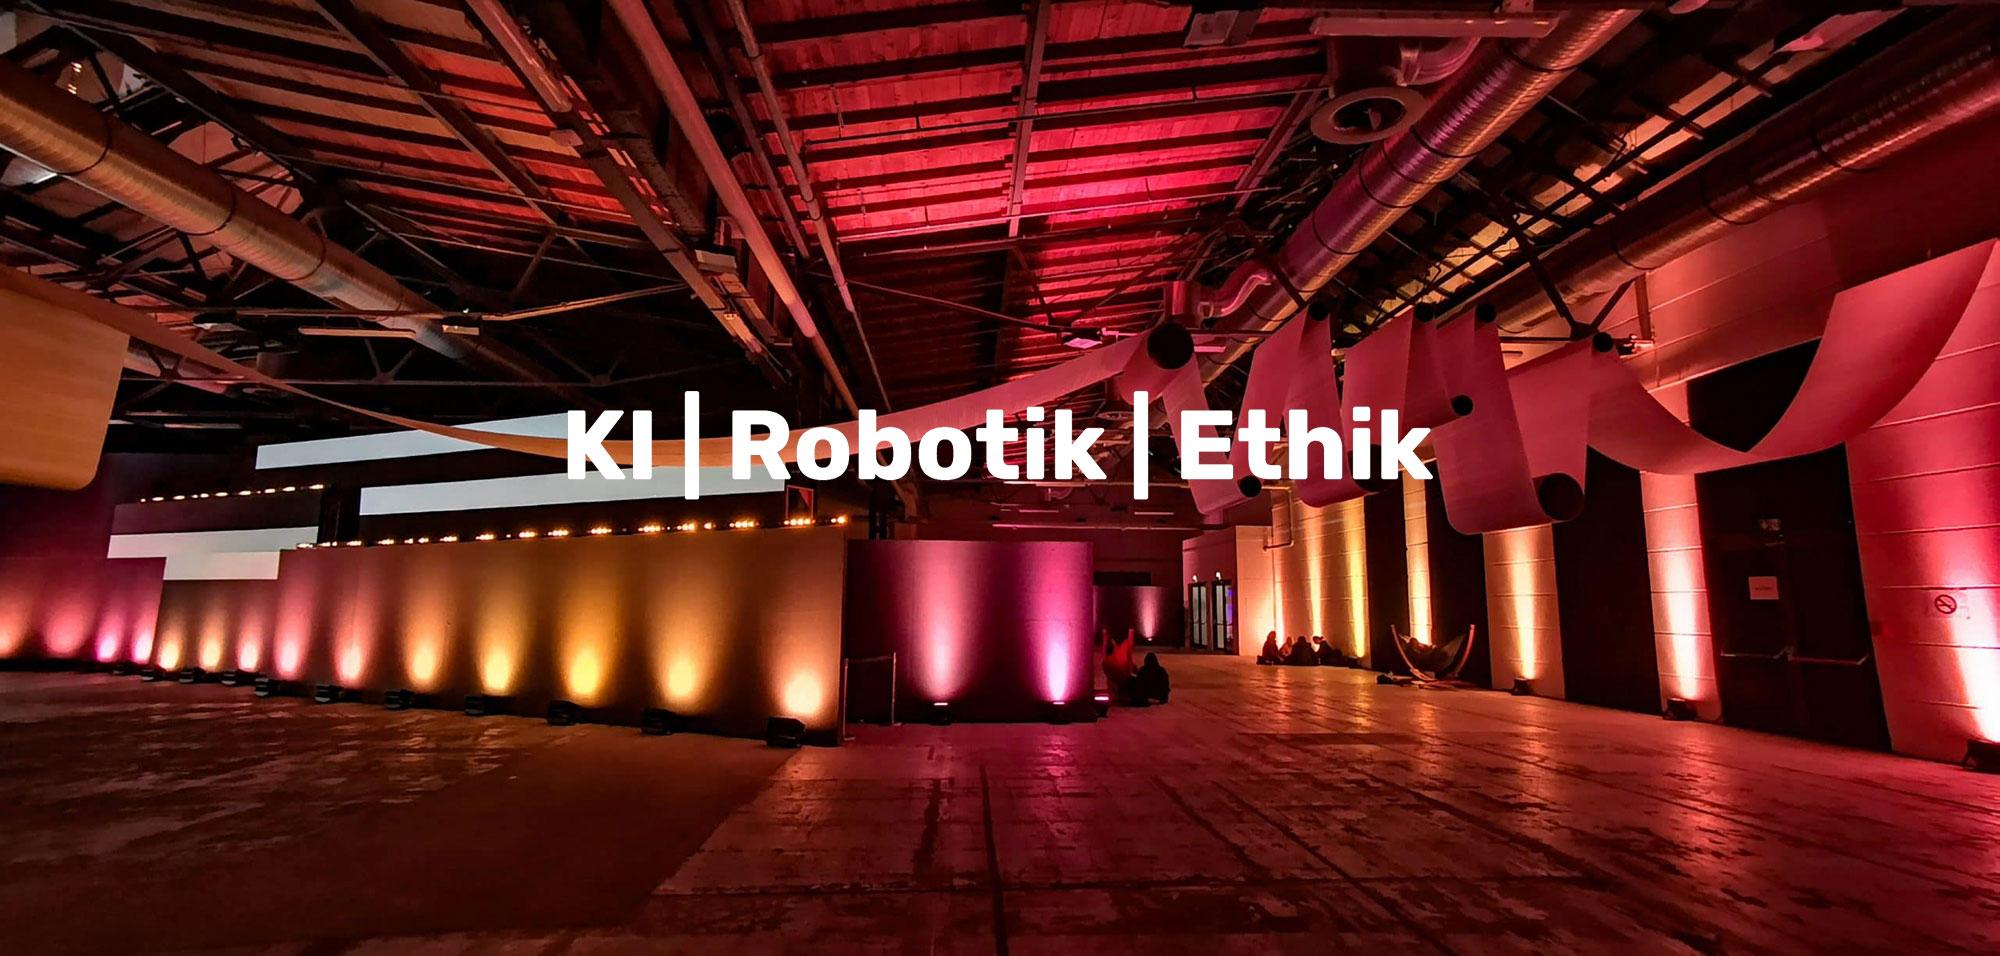 ki-robotik-ethik